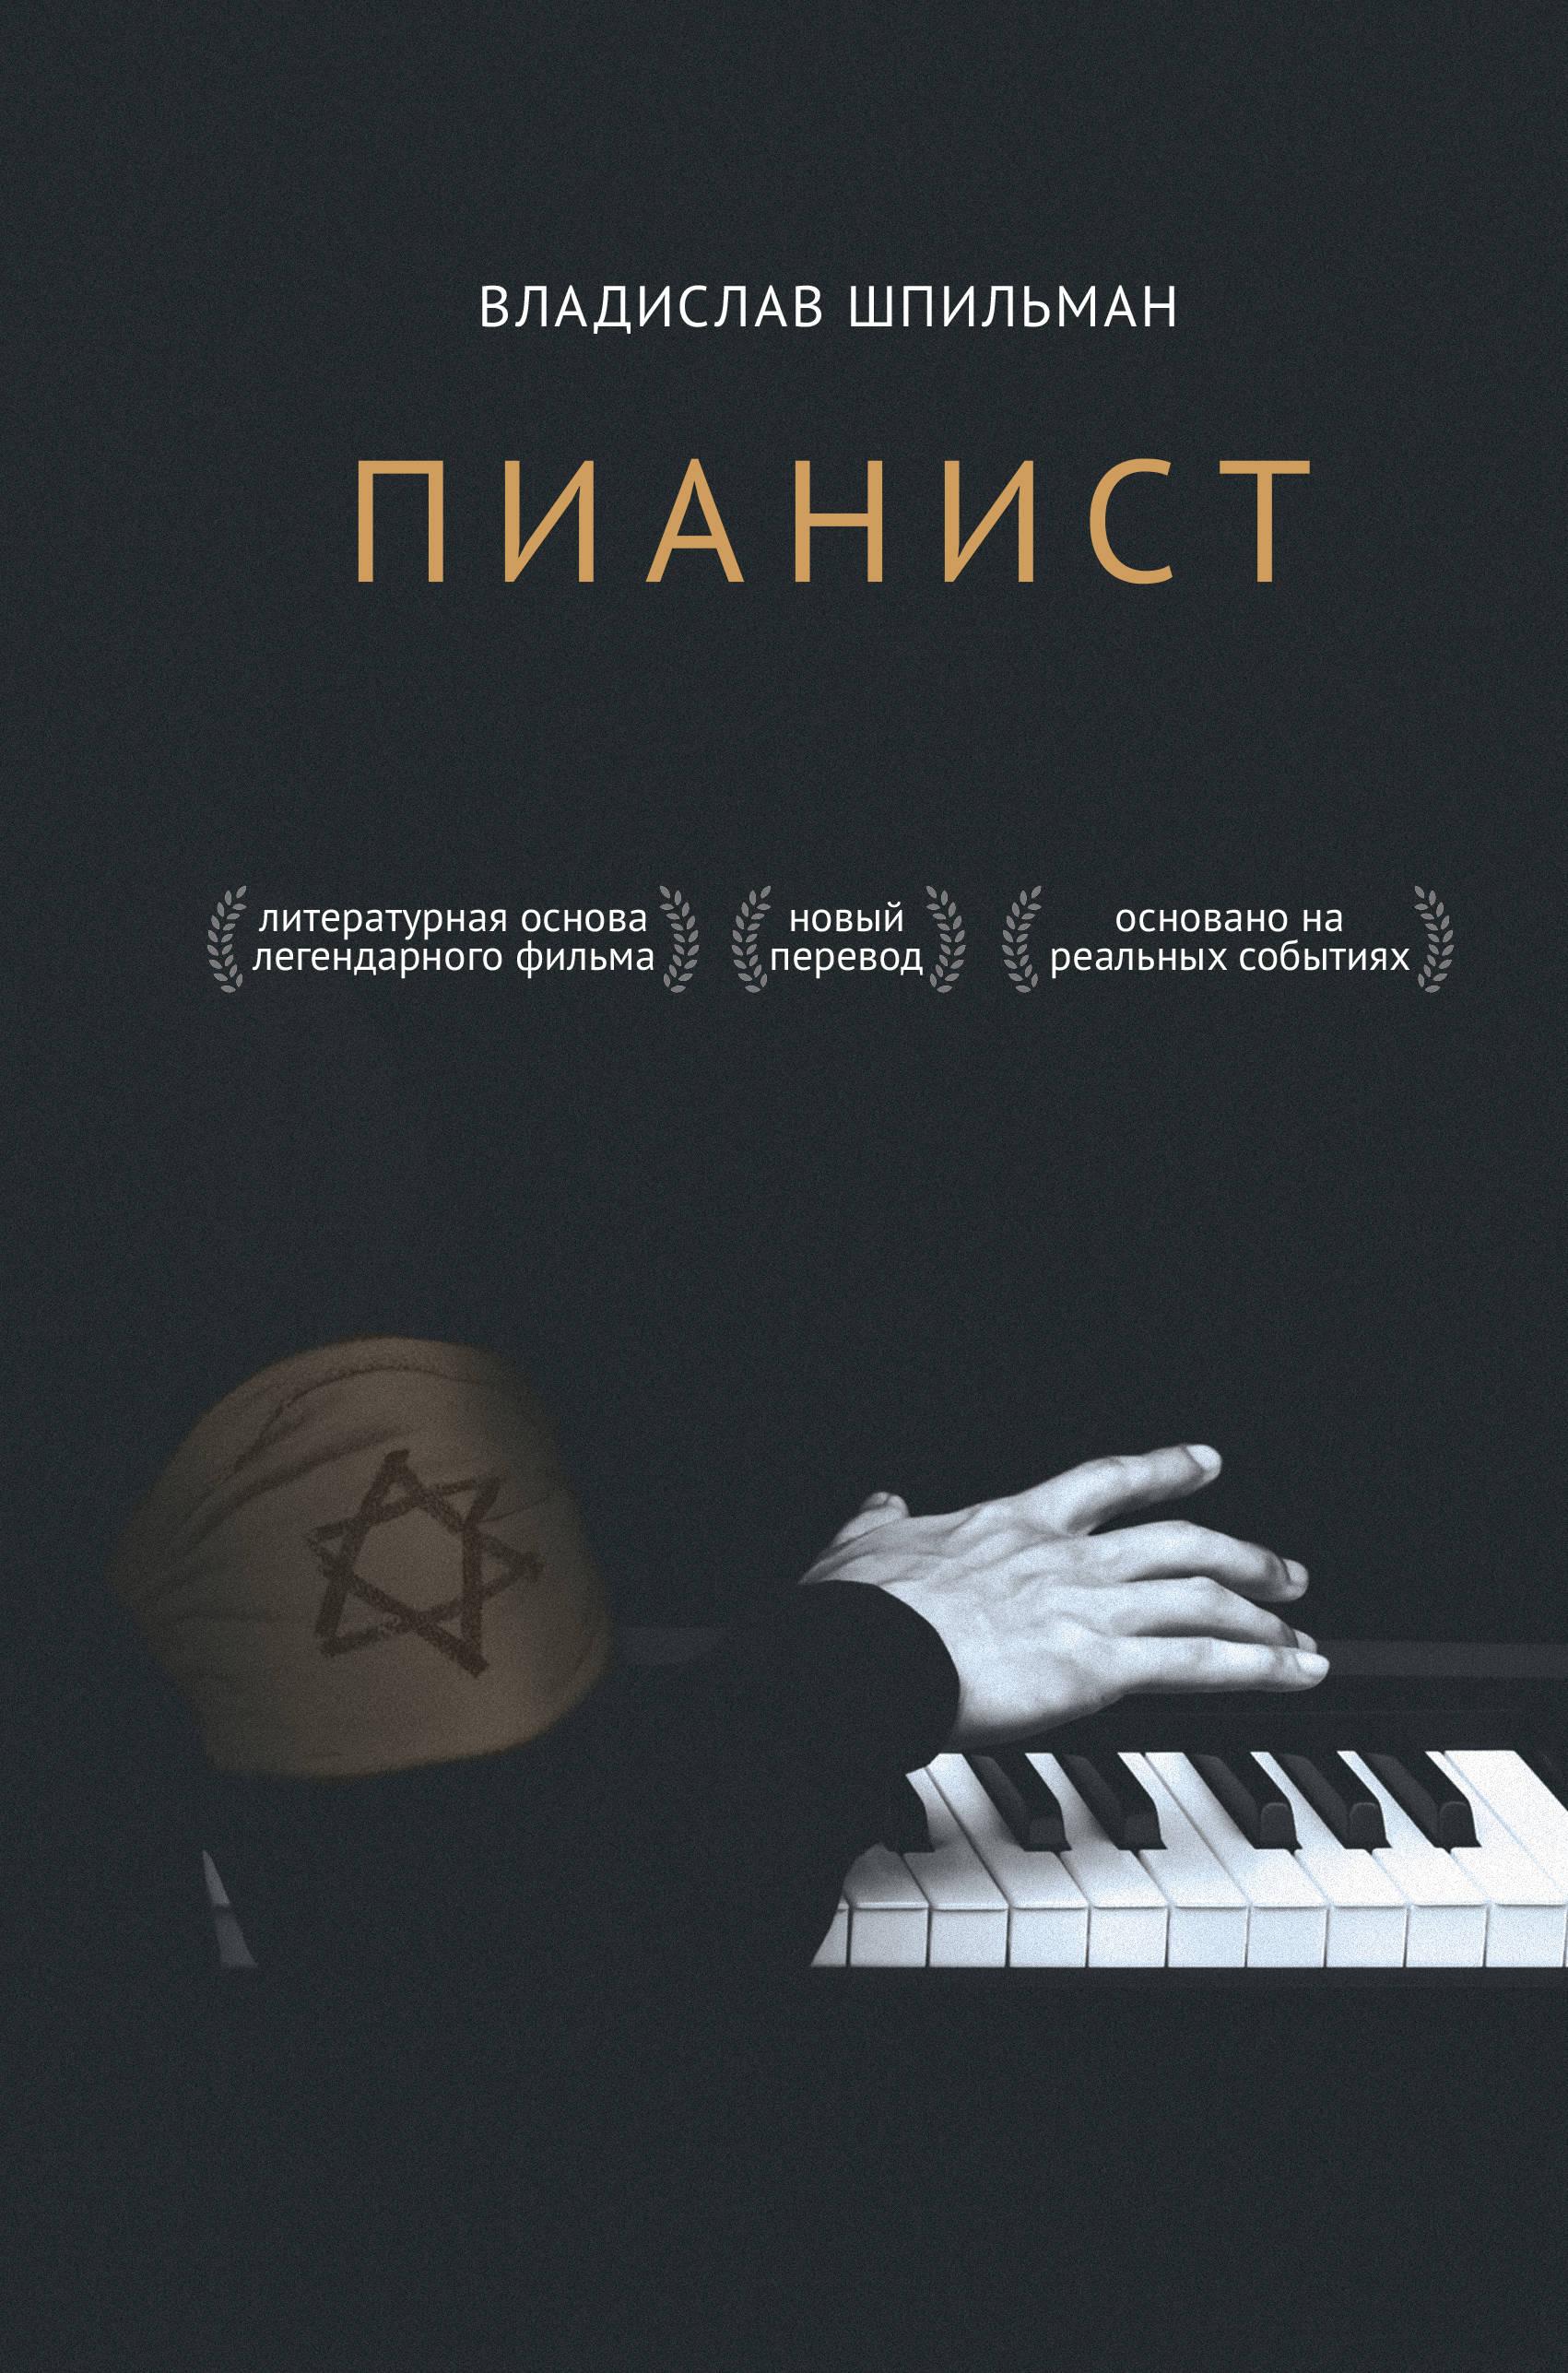 «Пианист» Владислав Шпильман